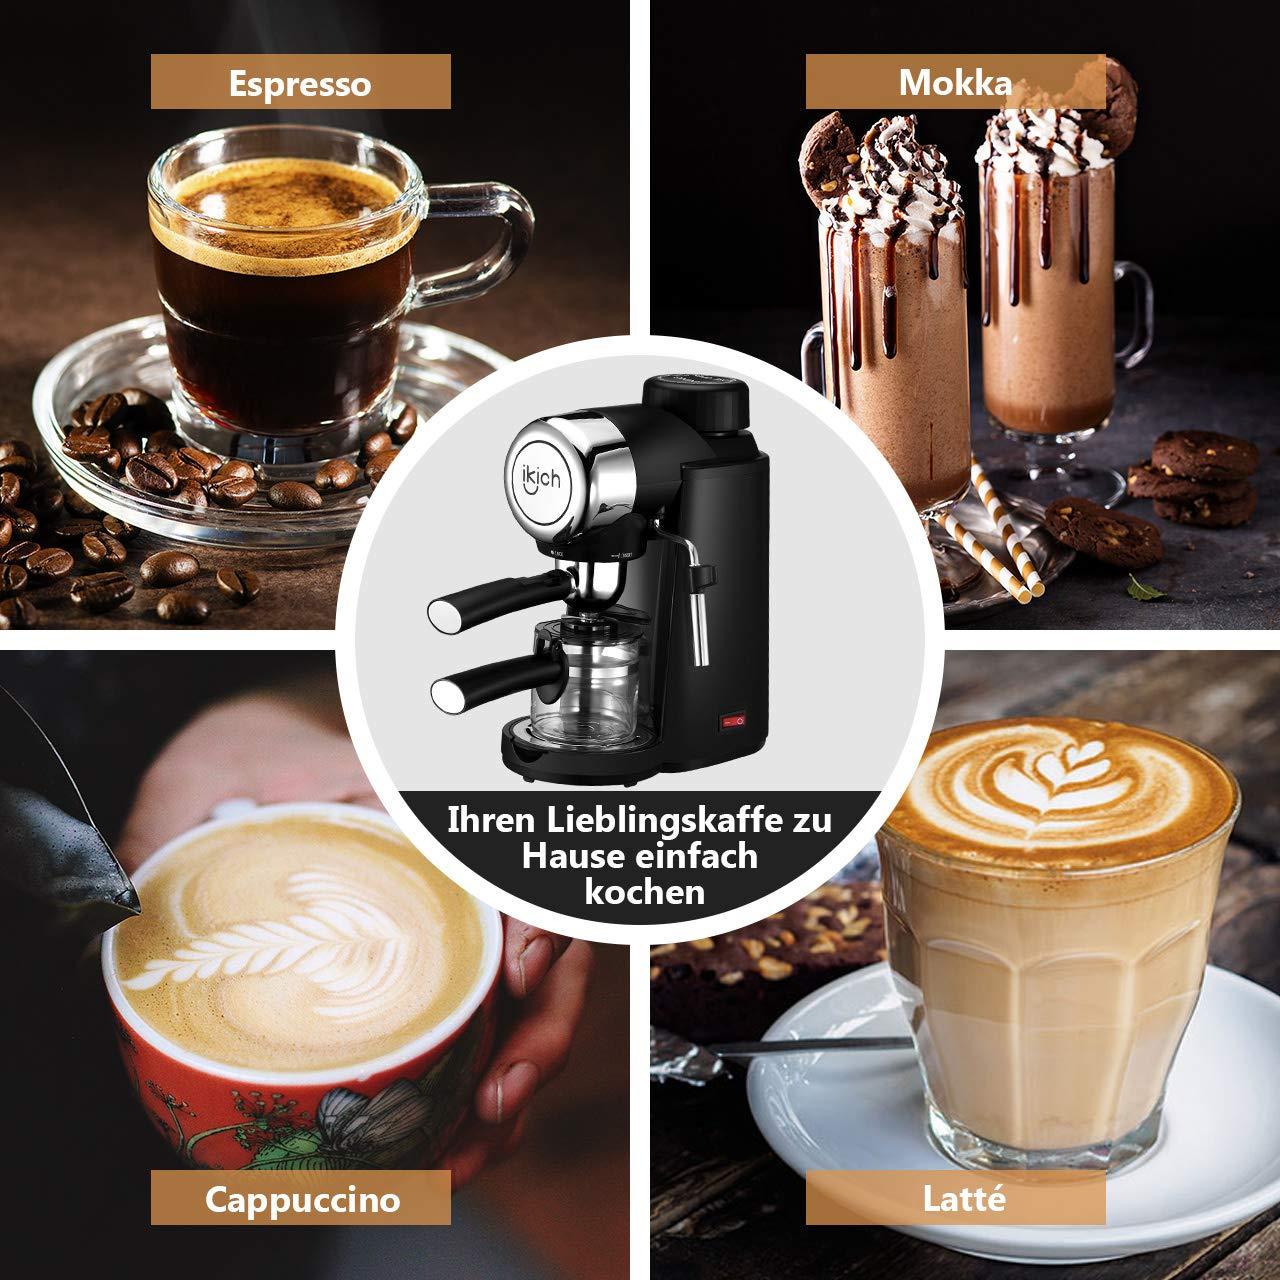 IKICH Cafetera espresso Negro Cafetera Espresso con Jarra Cafetera Capuchino con Espumador de Leche de Vapor M/áquina de Caf/é